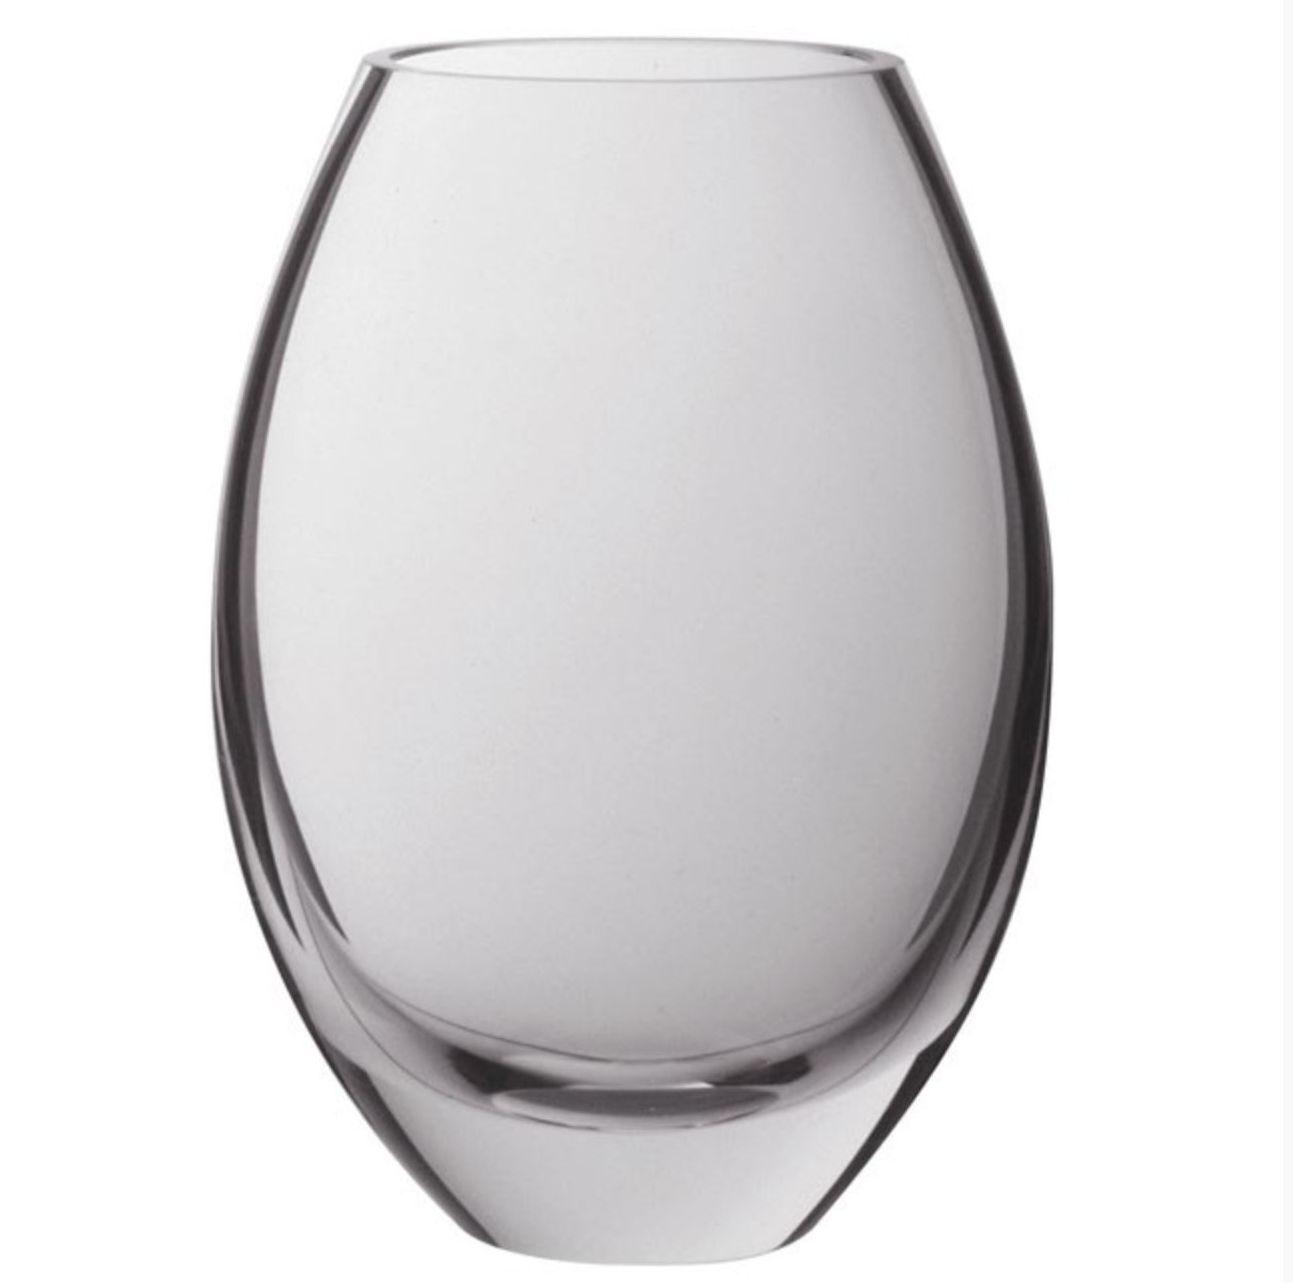 10 OFF 10 Pieces  Champagne Glass Pendant  Wholesale